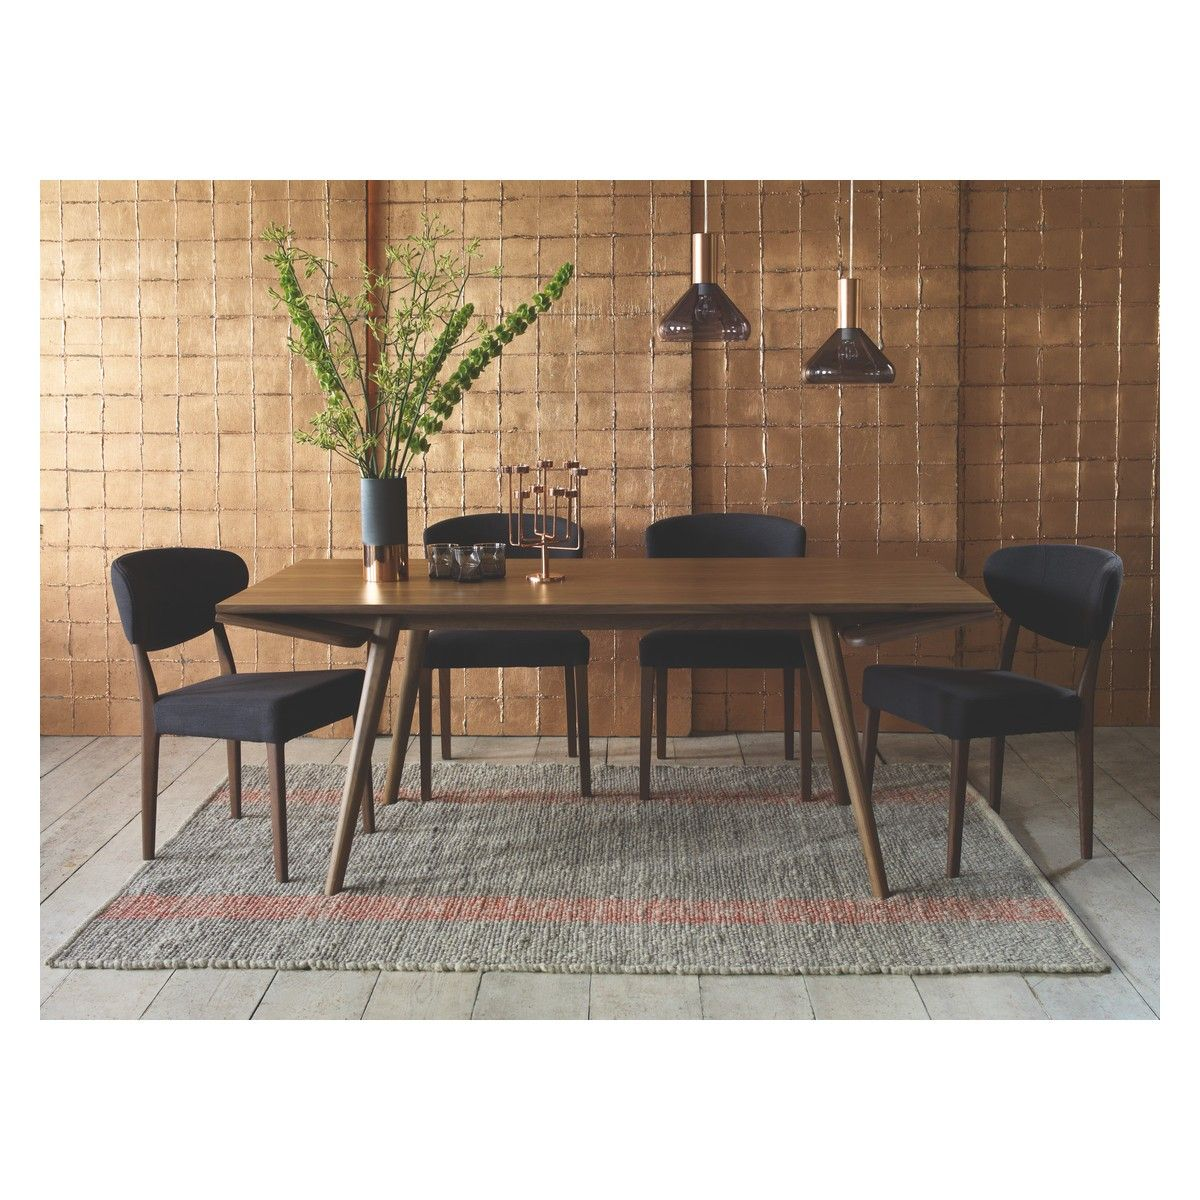 COPPER Black Top Copper Vase Grey Upholstered Dining ChairsCopper CeilingKitchen LightingBlack